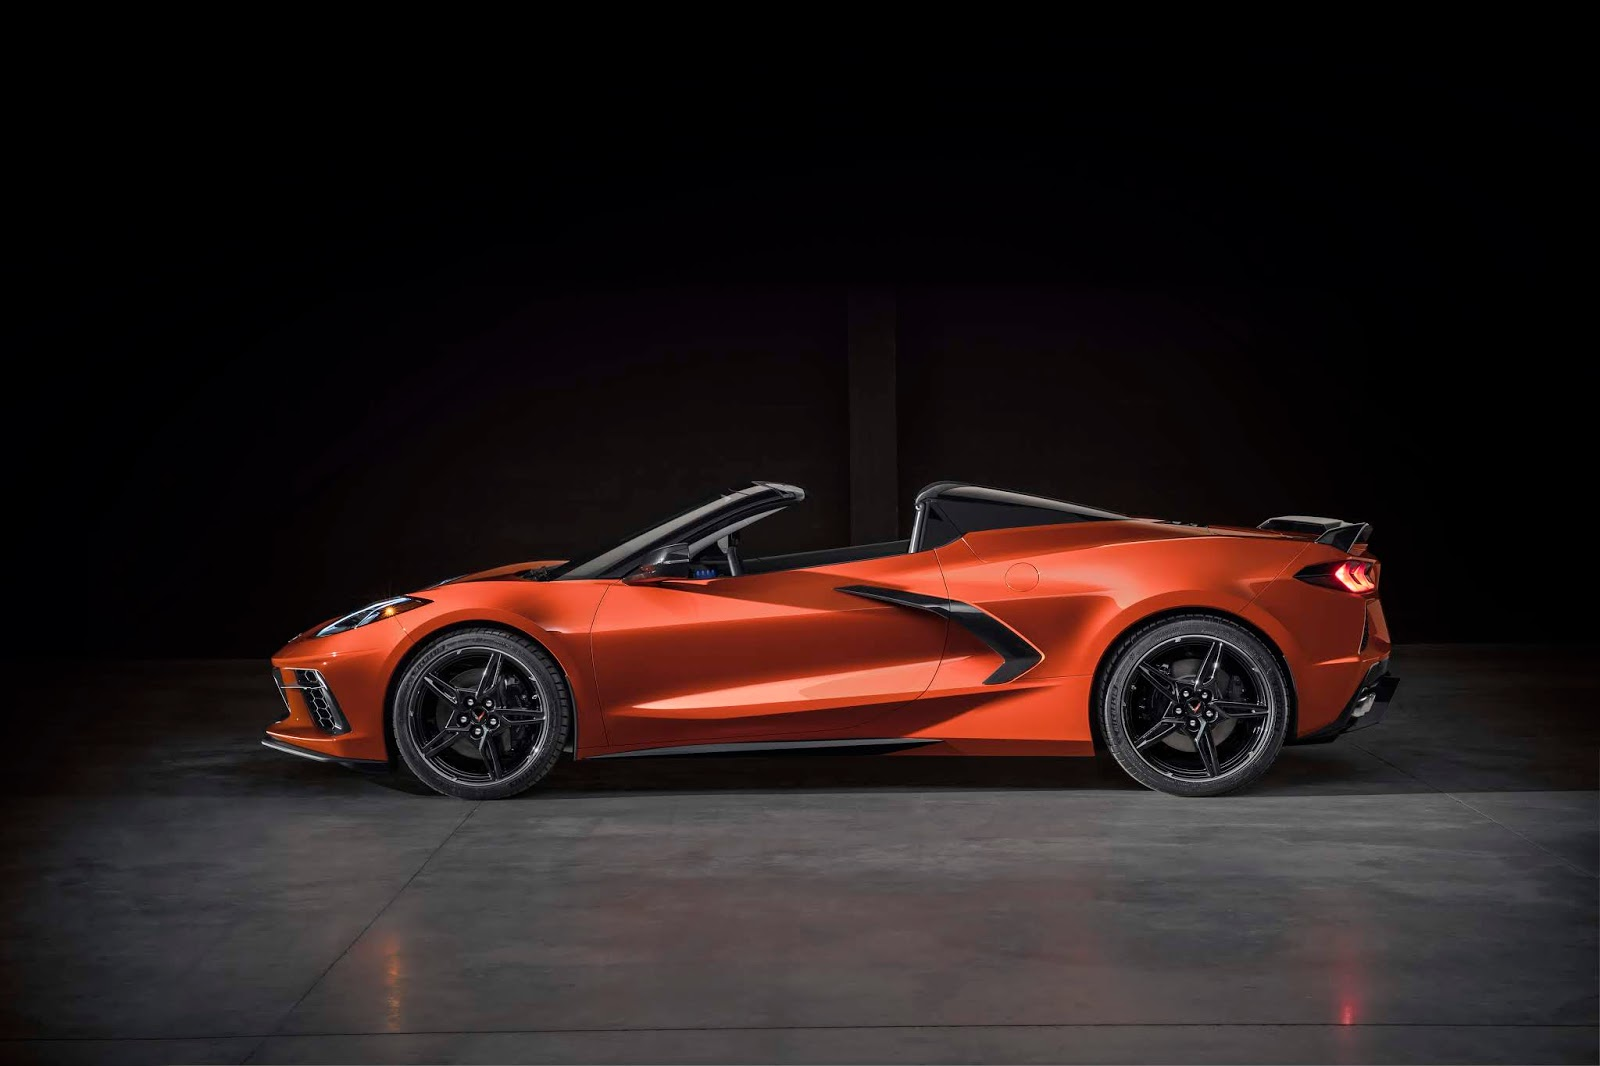 2020 Chevrolet Corvette Stingray Convertible 009 Γιατί η C8 Convertible είναι η καλύτερη Corvette ever C8, Chevrolet, Chevrolet Corvette, Corvette, zblog, ειδήσεις, καινούργιο, καινούρια, καινούριο